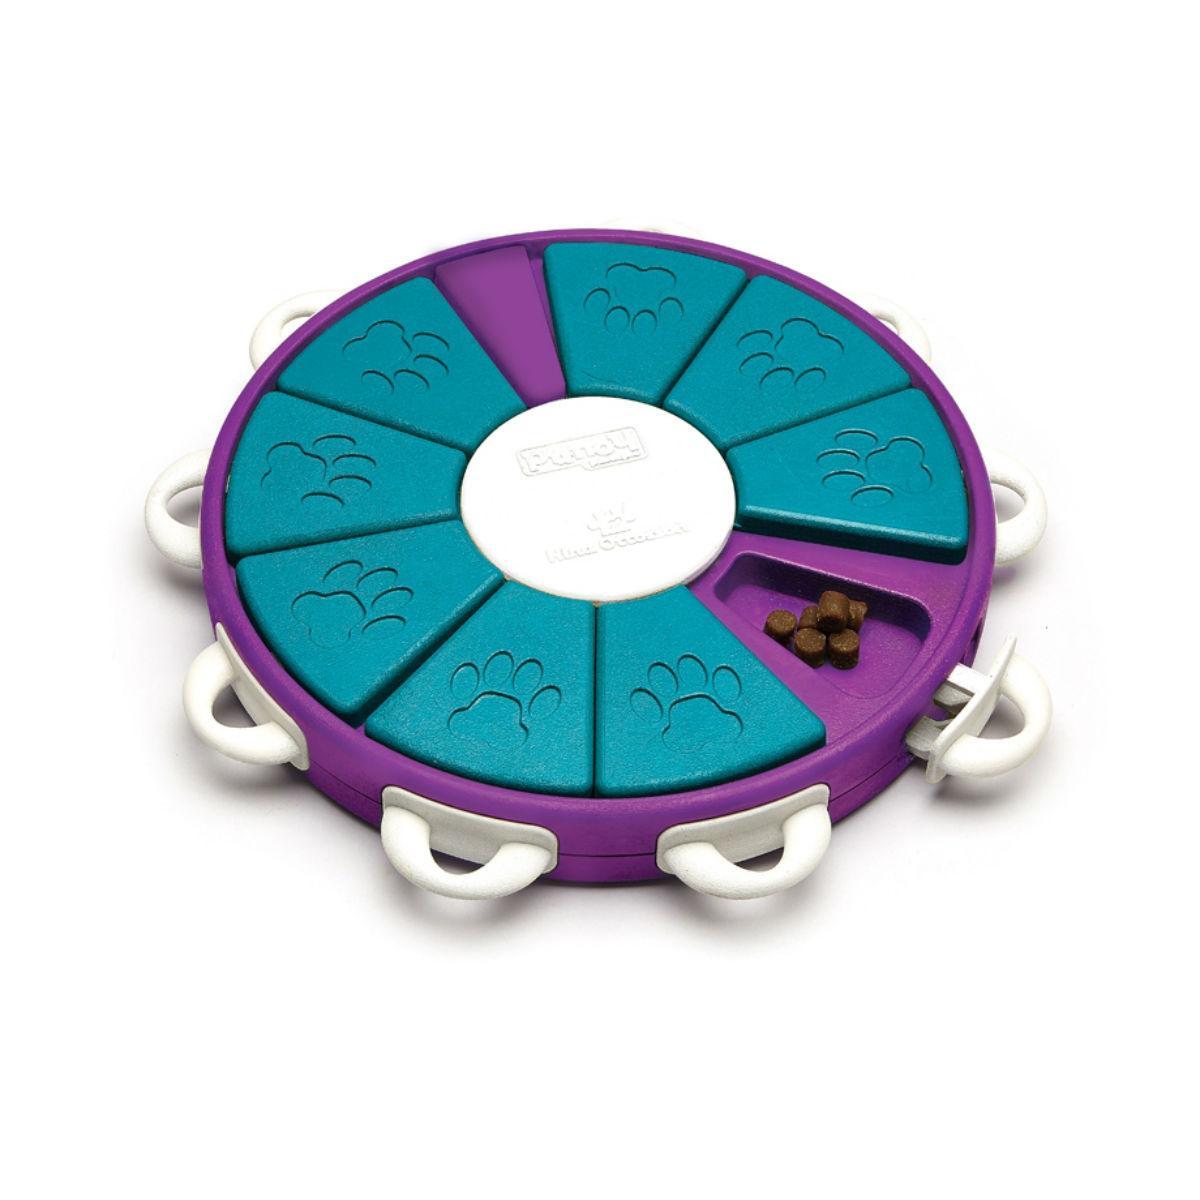 Nina Ottosson Puzzle Dog Toy - Twister